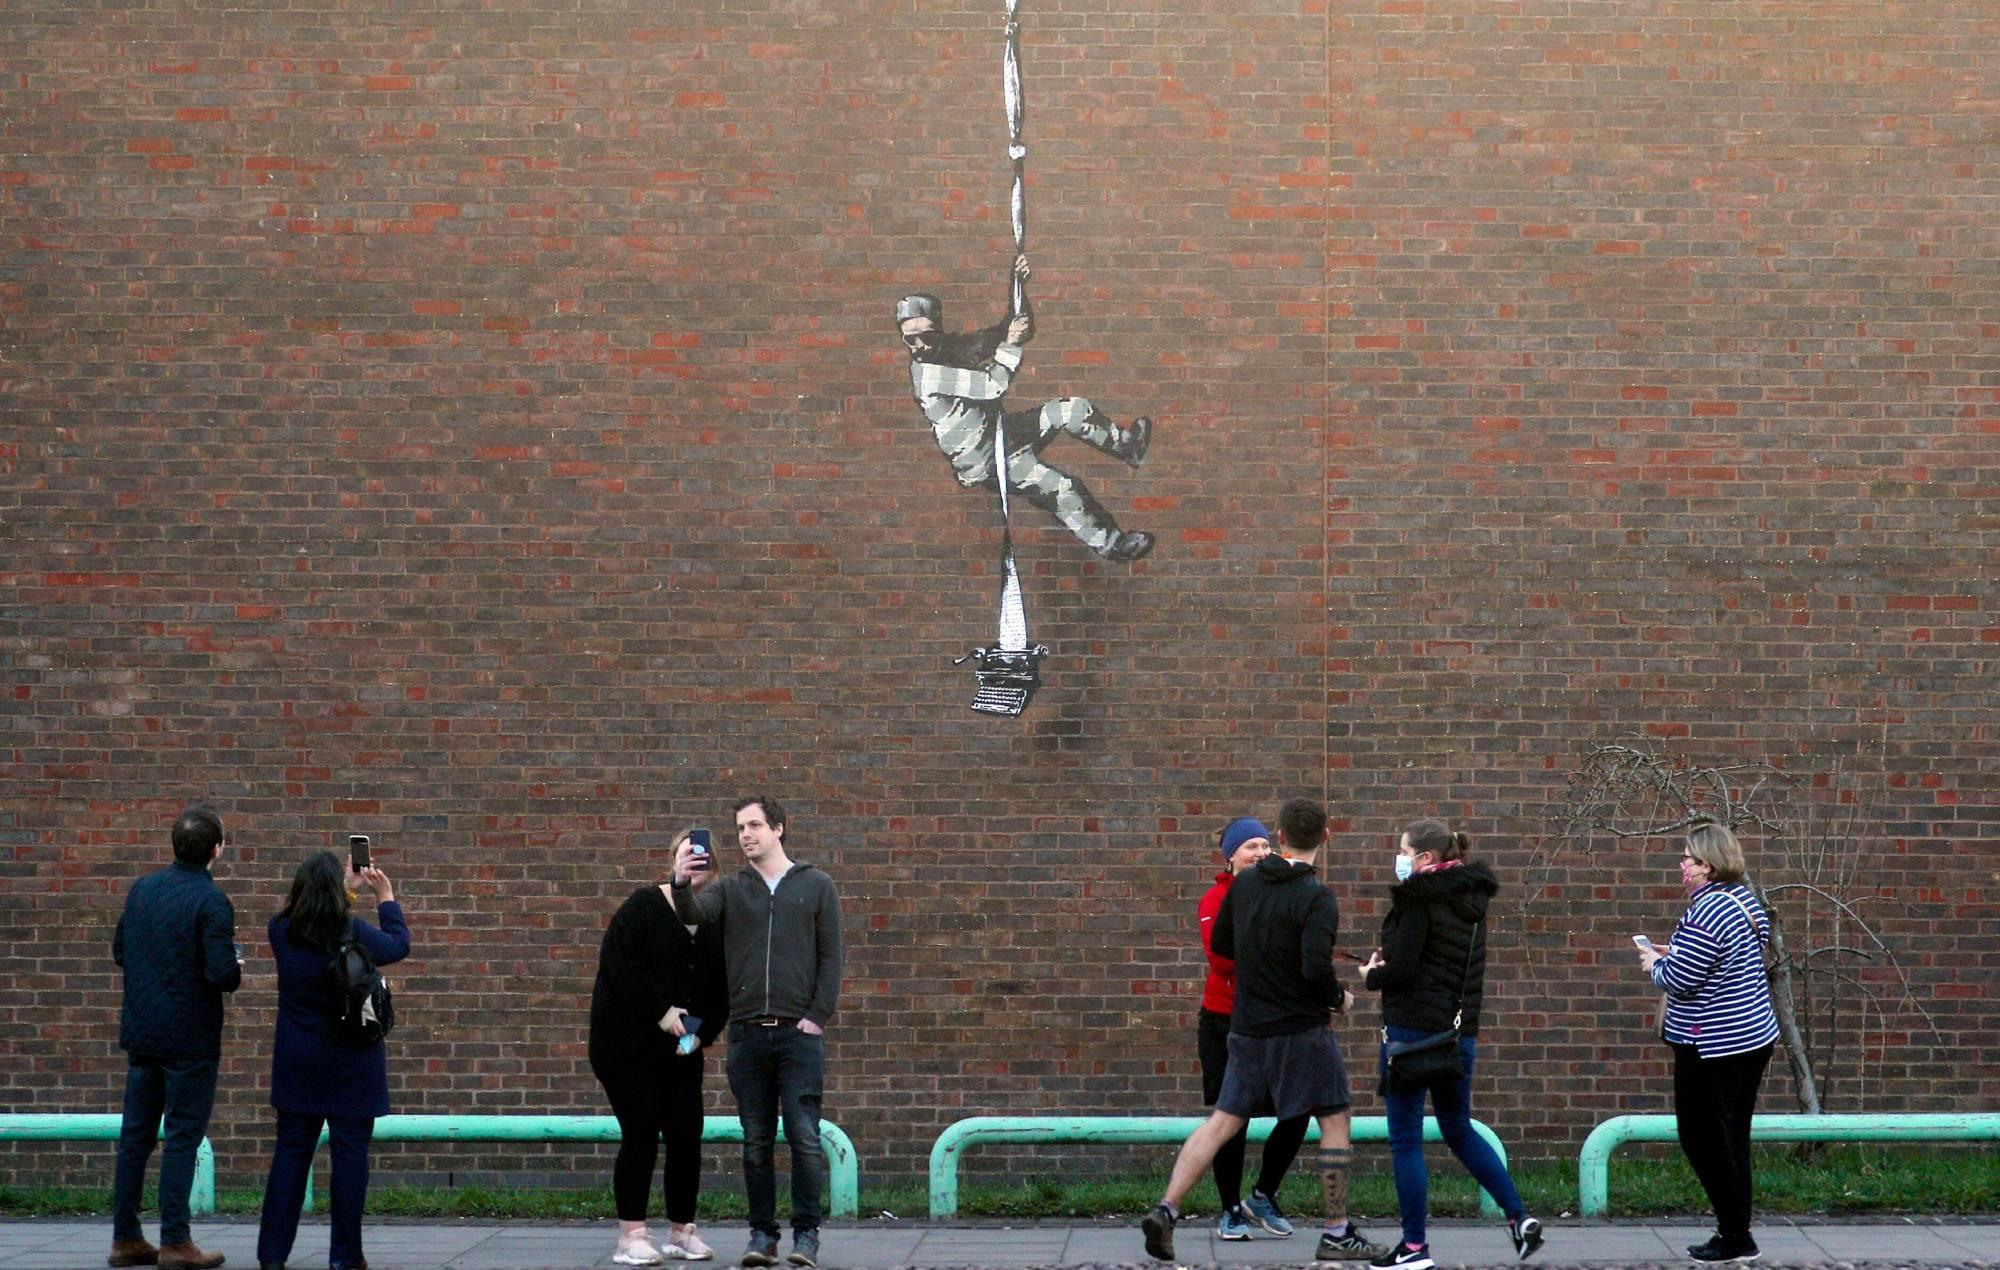 Kate Winslet backs plan to turn Reading Prison into arts venue following Banksy art 2